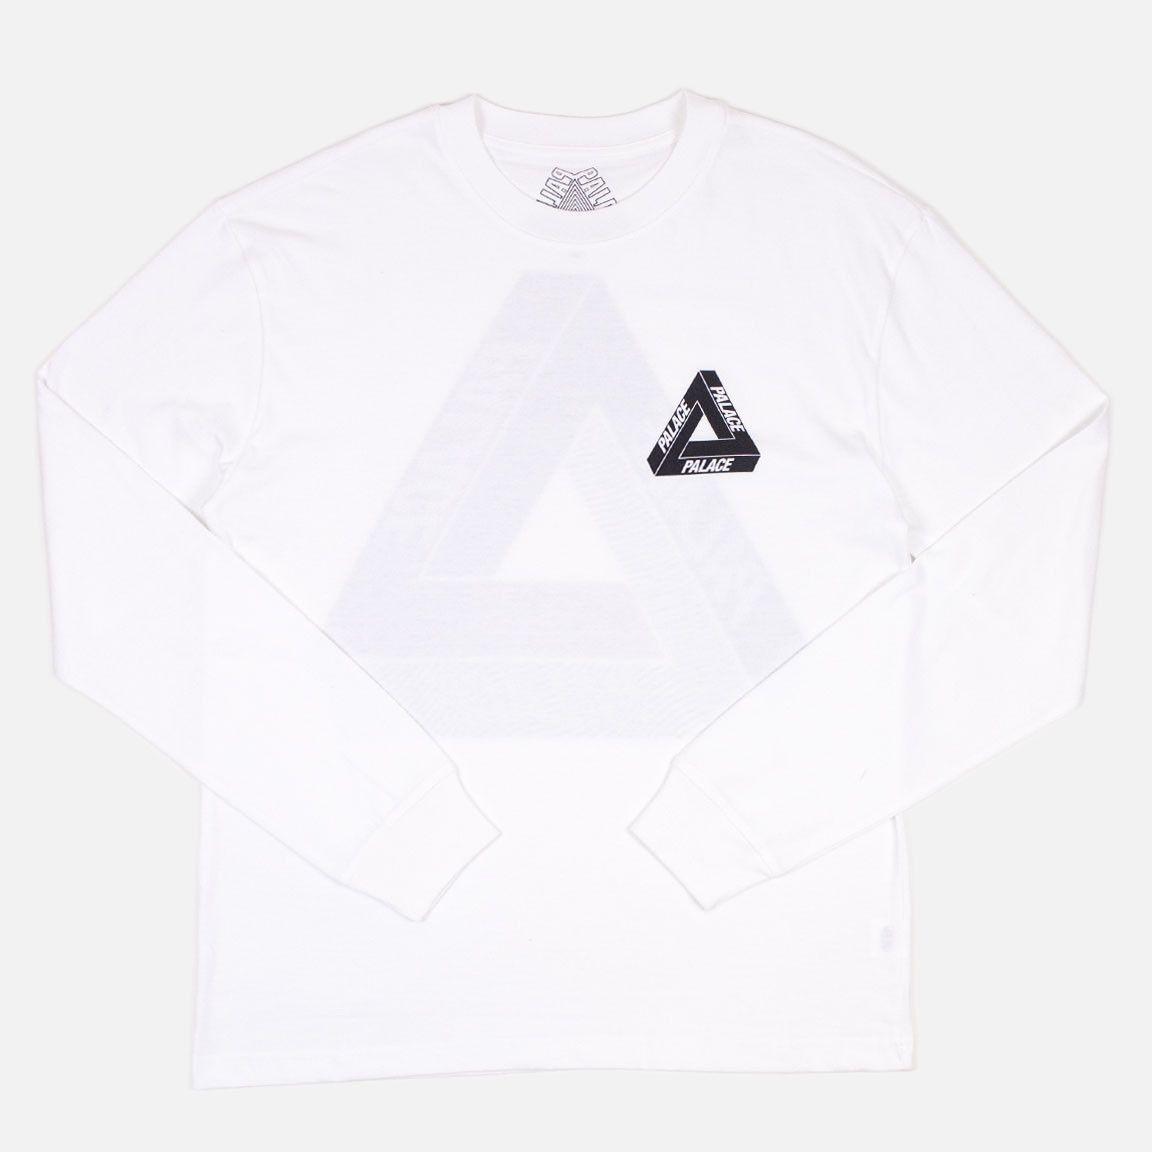 47ffb14f807f Palace Drury Italia Long Sleeve T Shirt - White